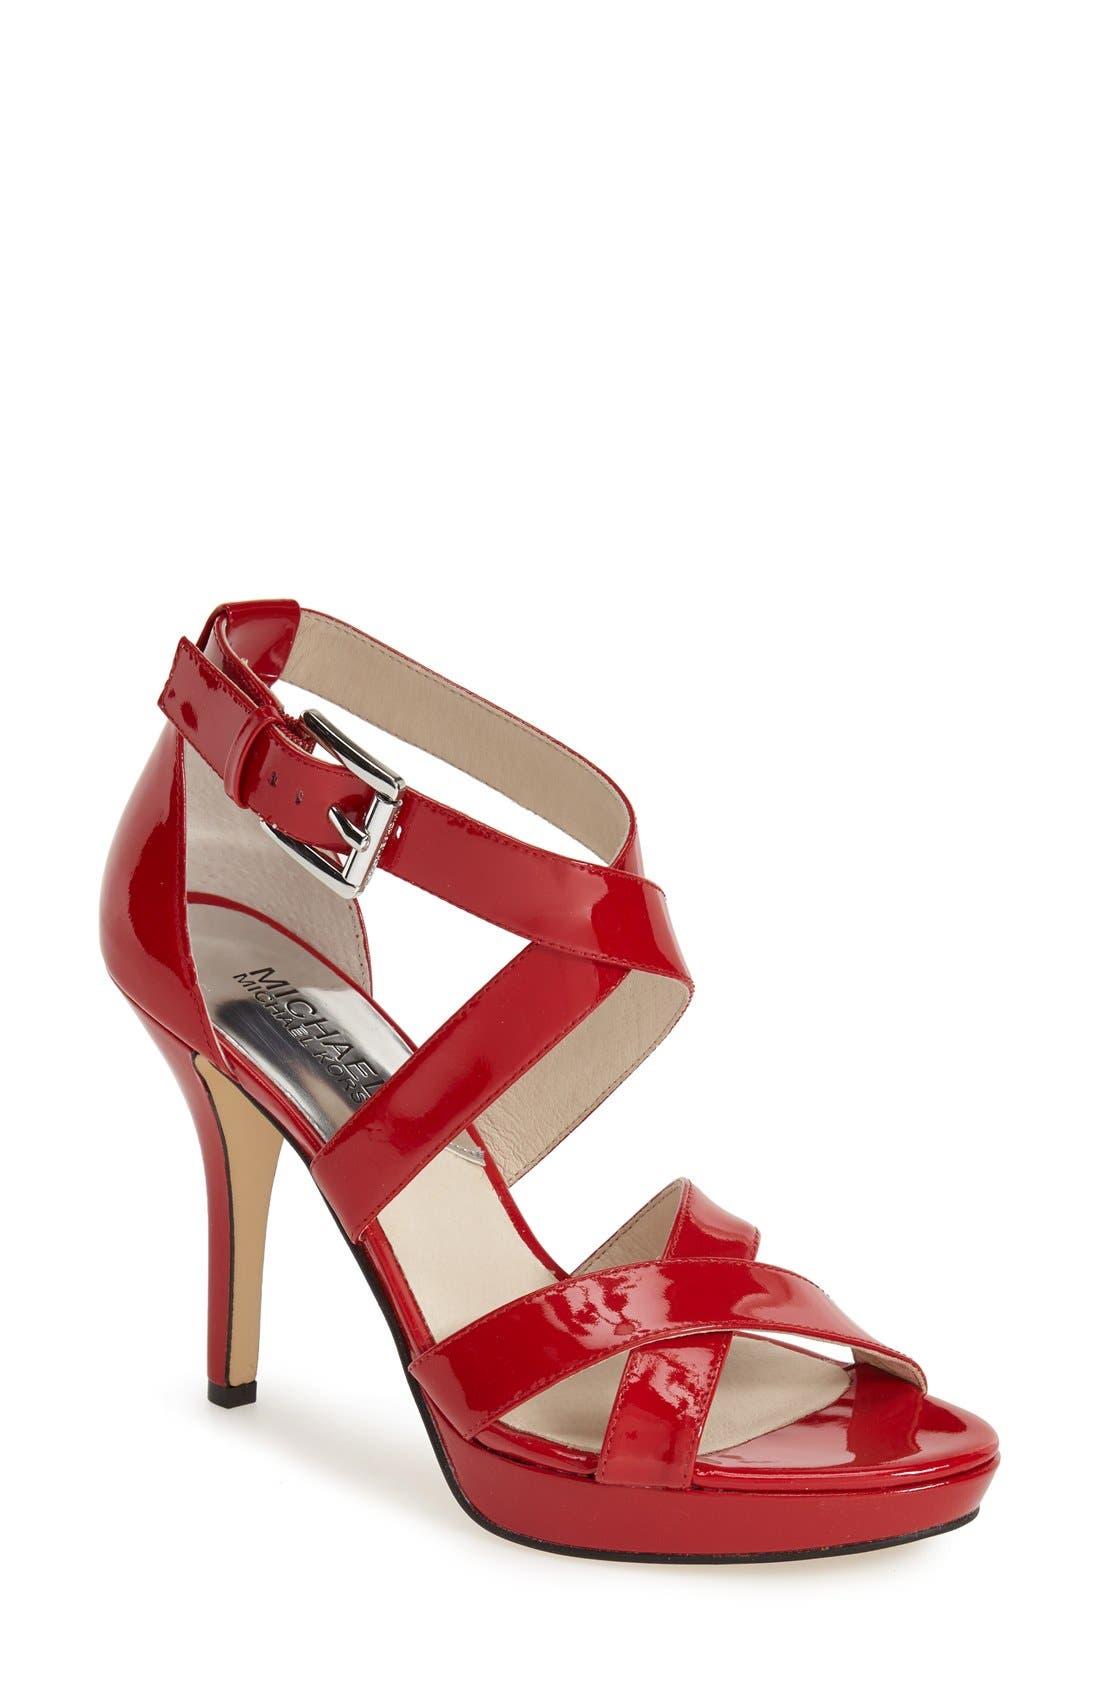 Alternate Image 1 Selected - MICHAEL Michael Kors 'Evie' Platform Sandal (Women)